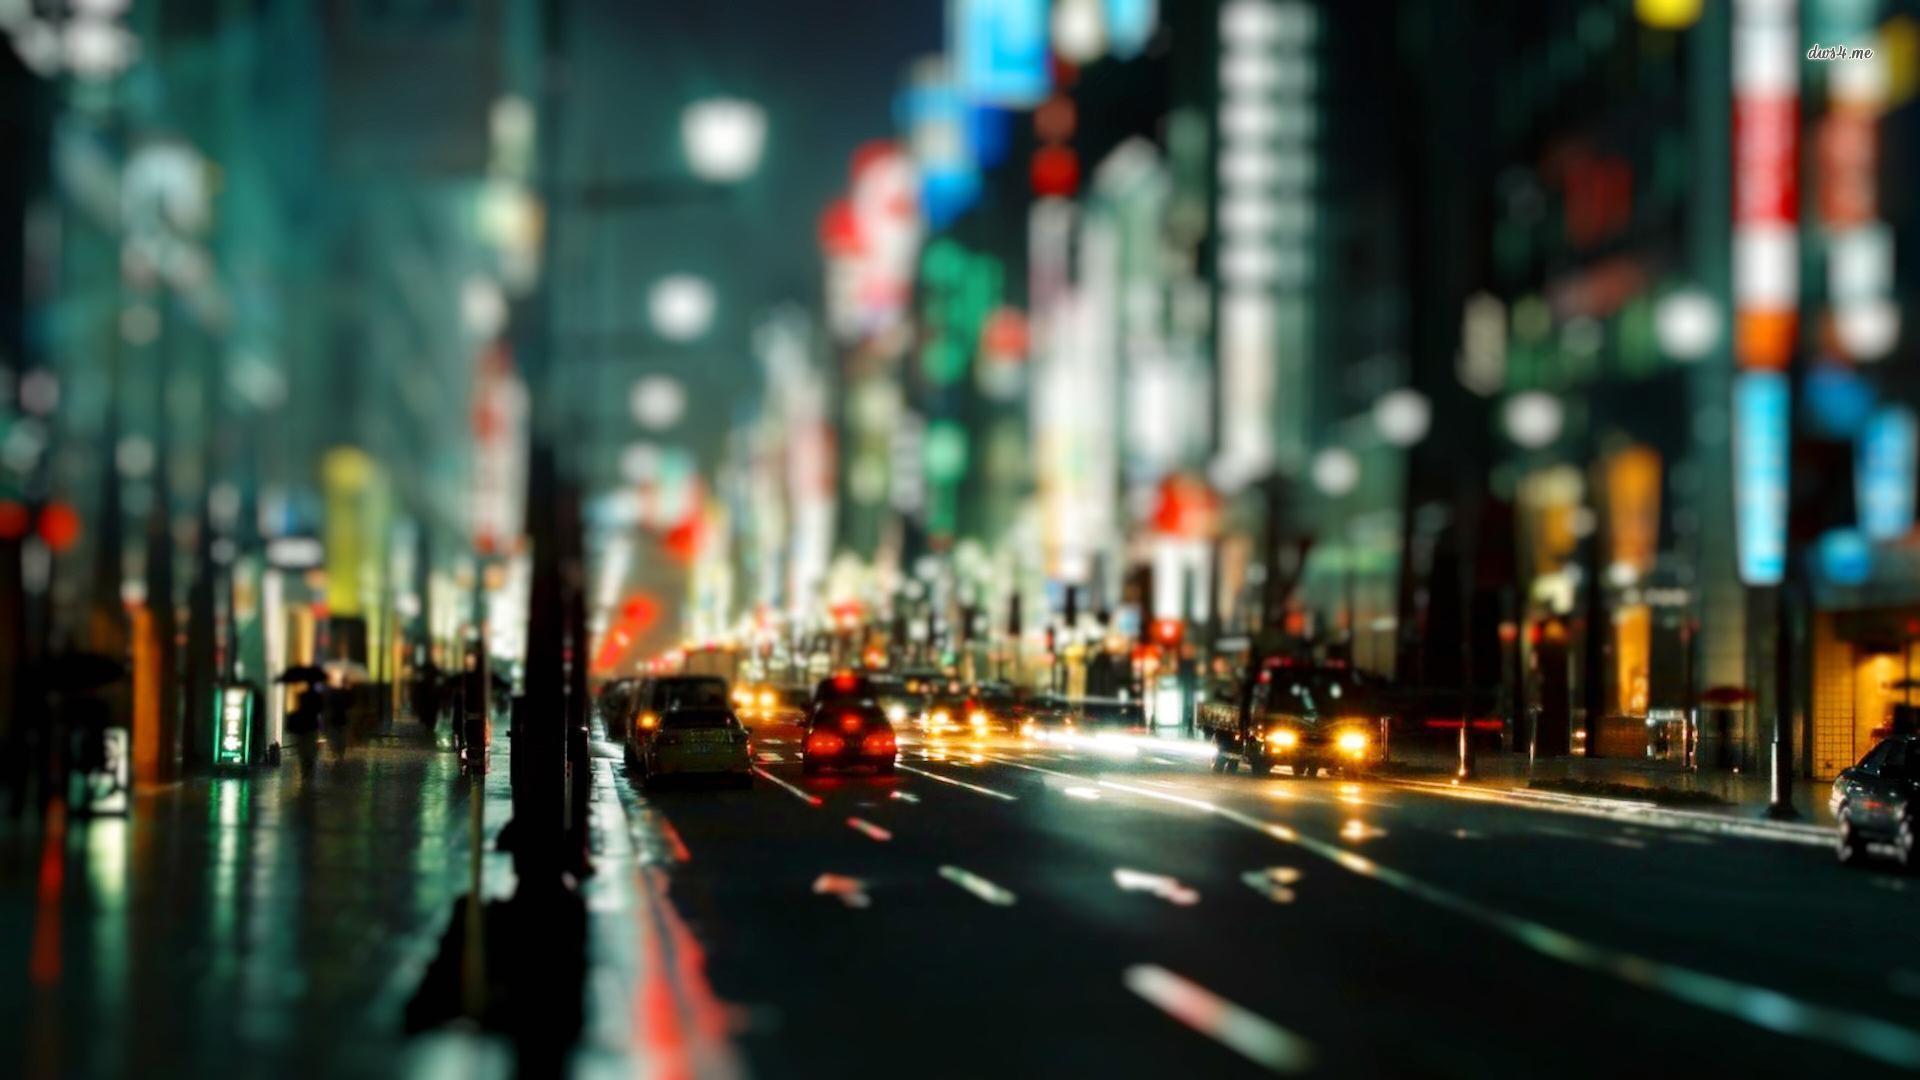 4916-blurred-city-street-1920×1080-world-wallpaper  